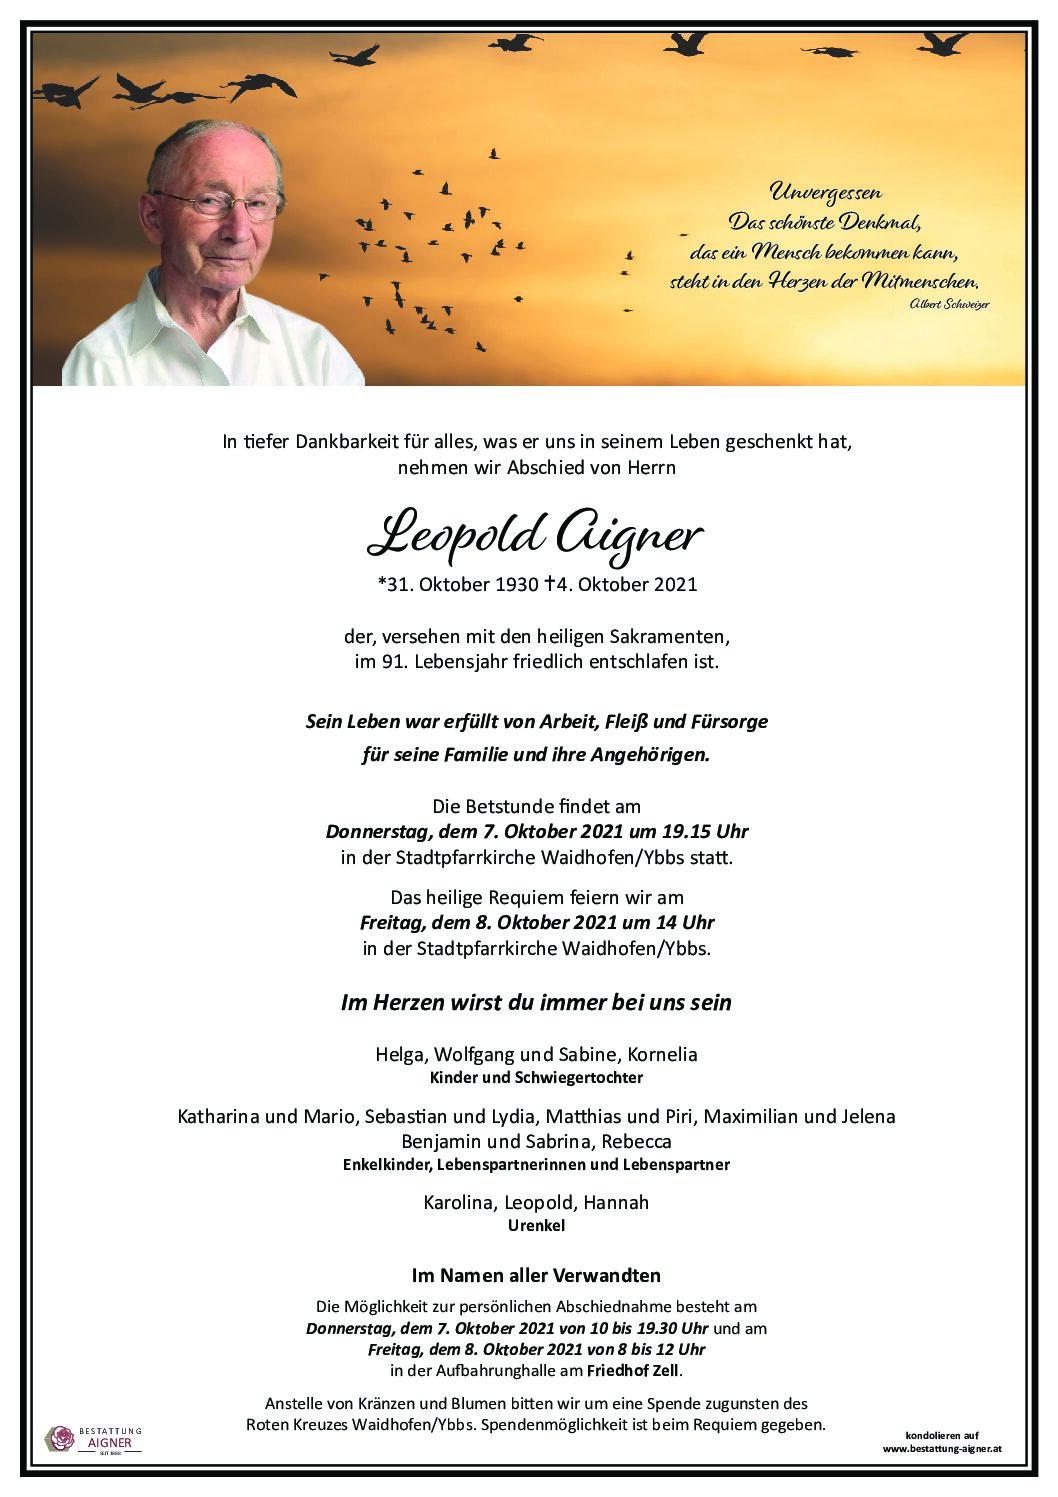 Leopold Aigner